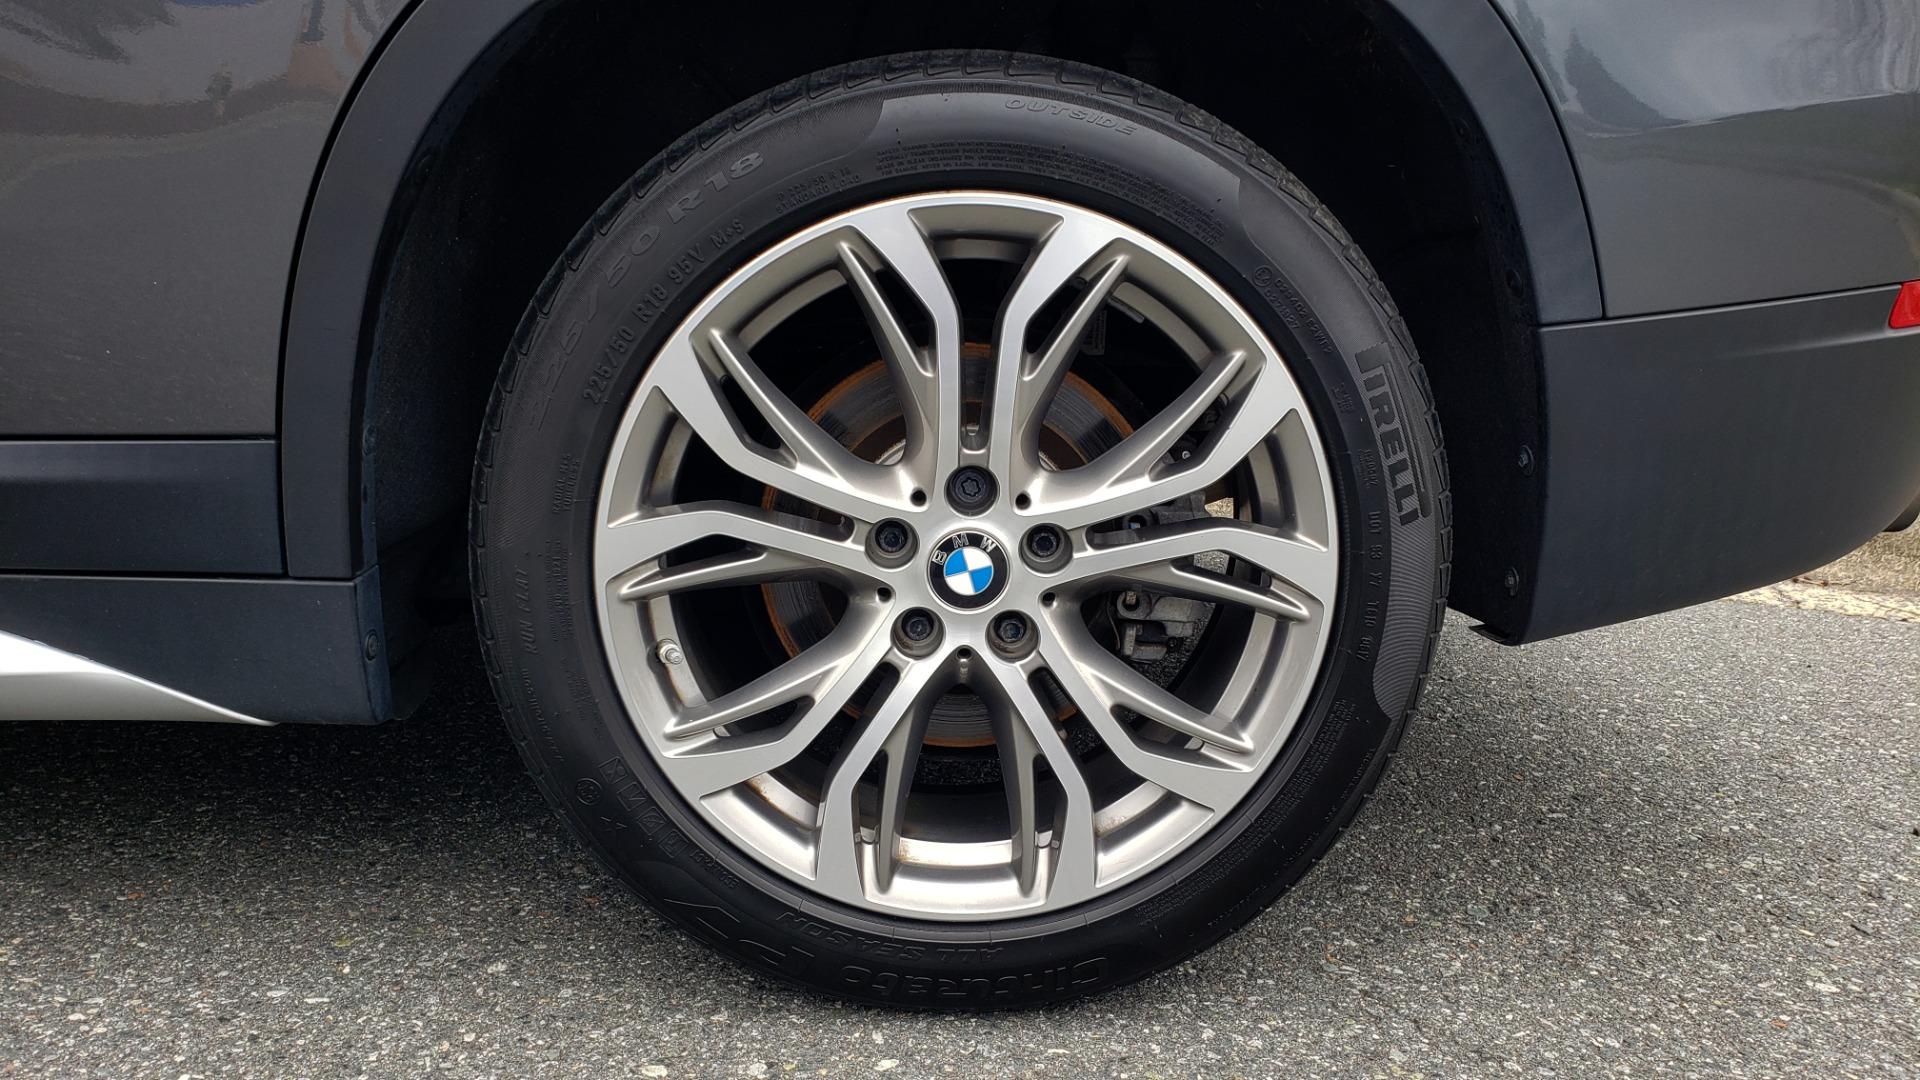 Used 2017 BMW X1 XDRIVE28I / PREM PKG / DRIVER ASST / NAV / CLD WTHR for sale Sold at Formula Imports in Charlotte NC 28227 84